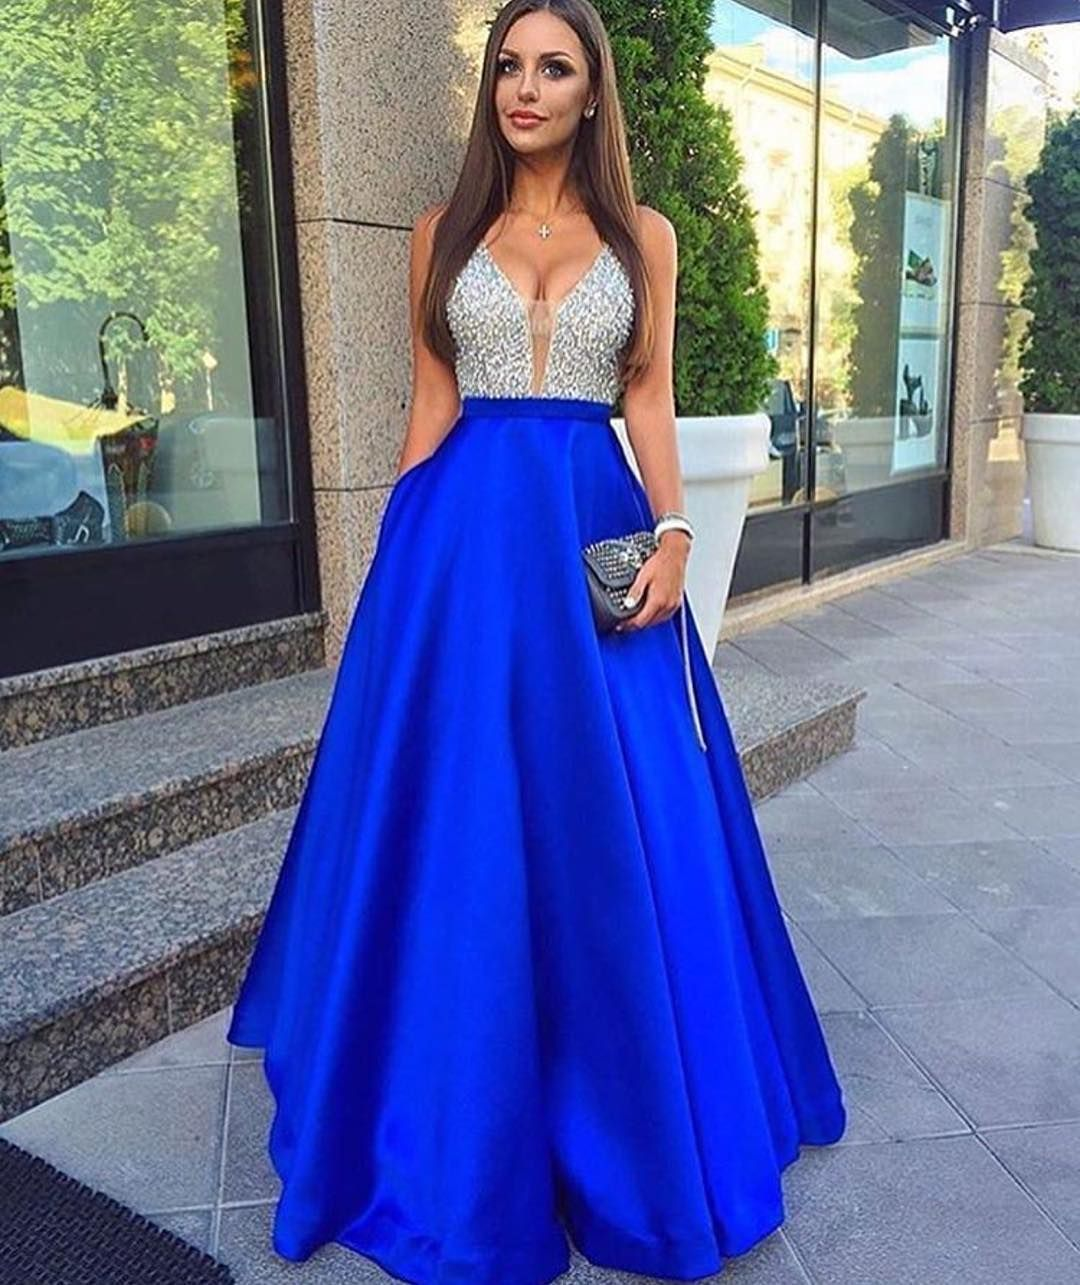 vestidodeprincesa sim ou não ??? _ _ _ _ _ _ _ . @katyperry ...